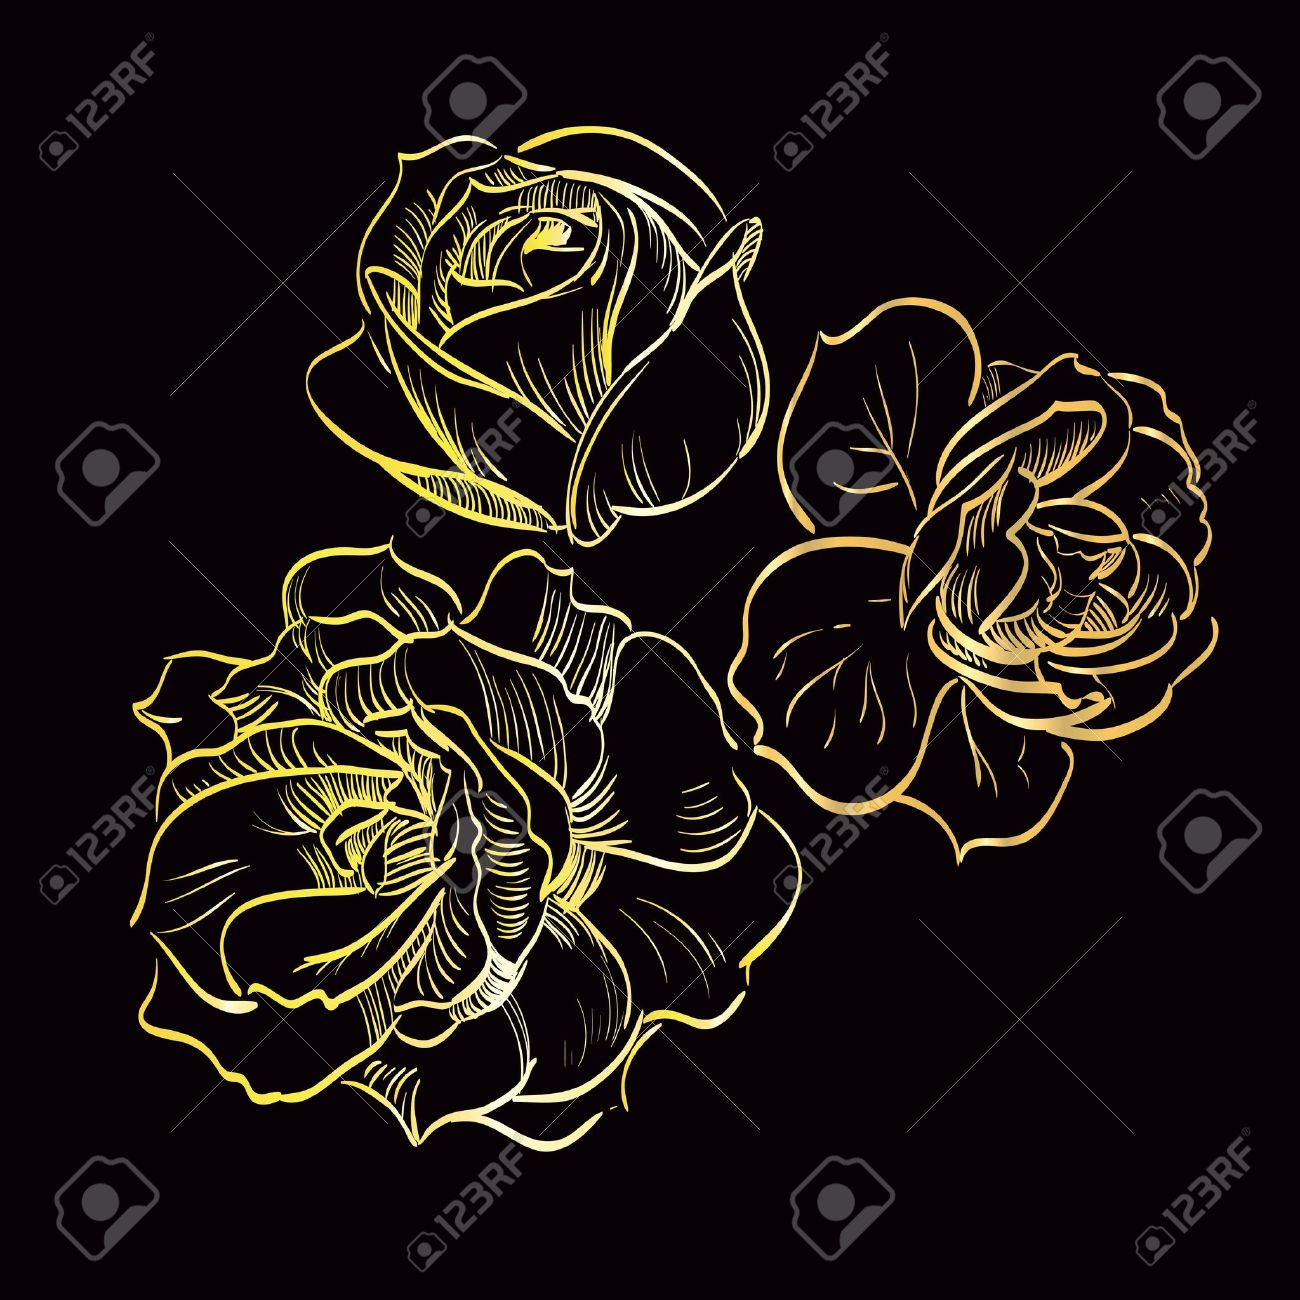 gold rose on black background Stock Vector - 14298448